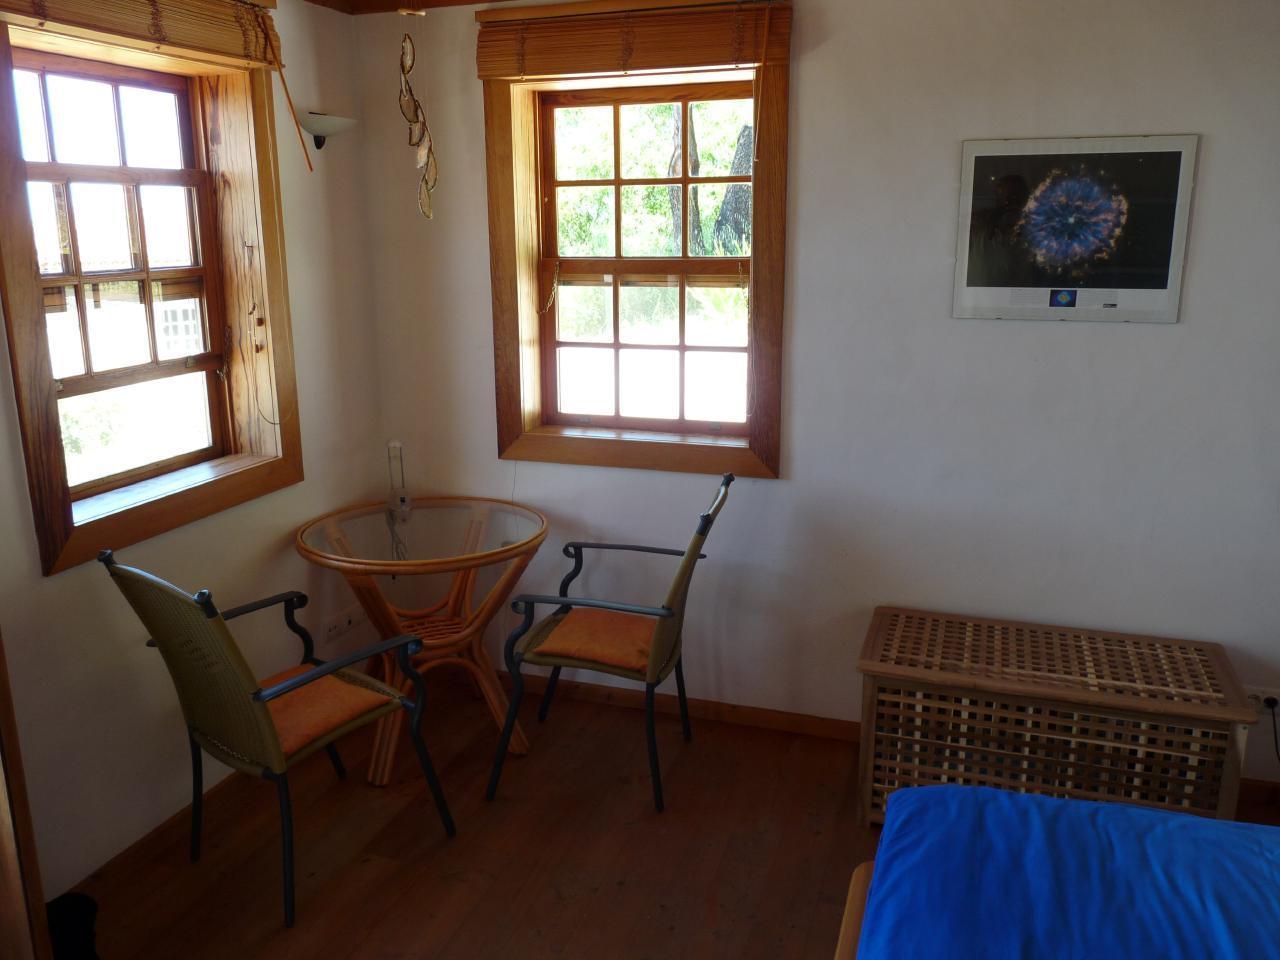 Ferienhaus FINCA TOPO DEL DRAGO (224349), Puntagorda, La Palma, Kanarische Inseln, Spanien, Bild 17